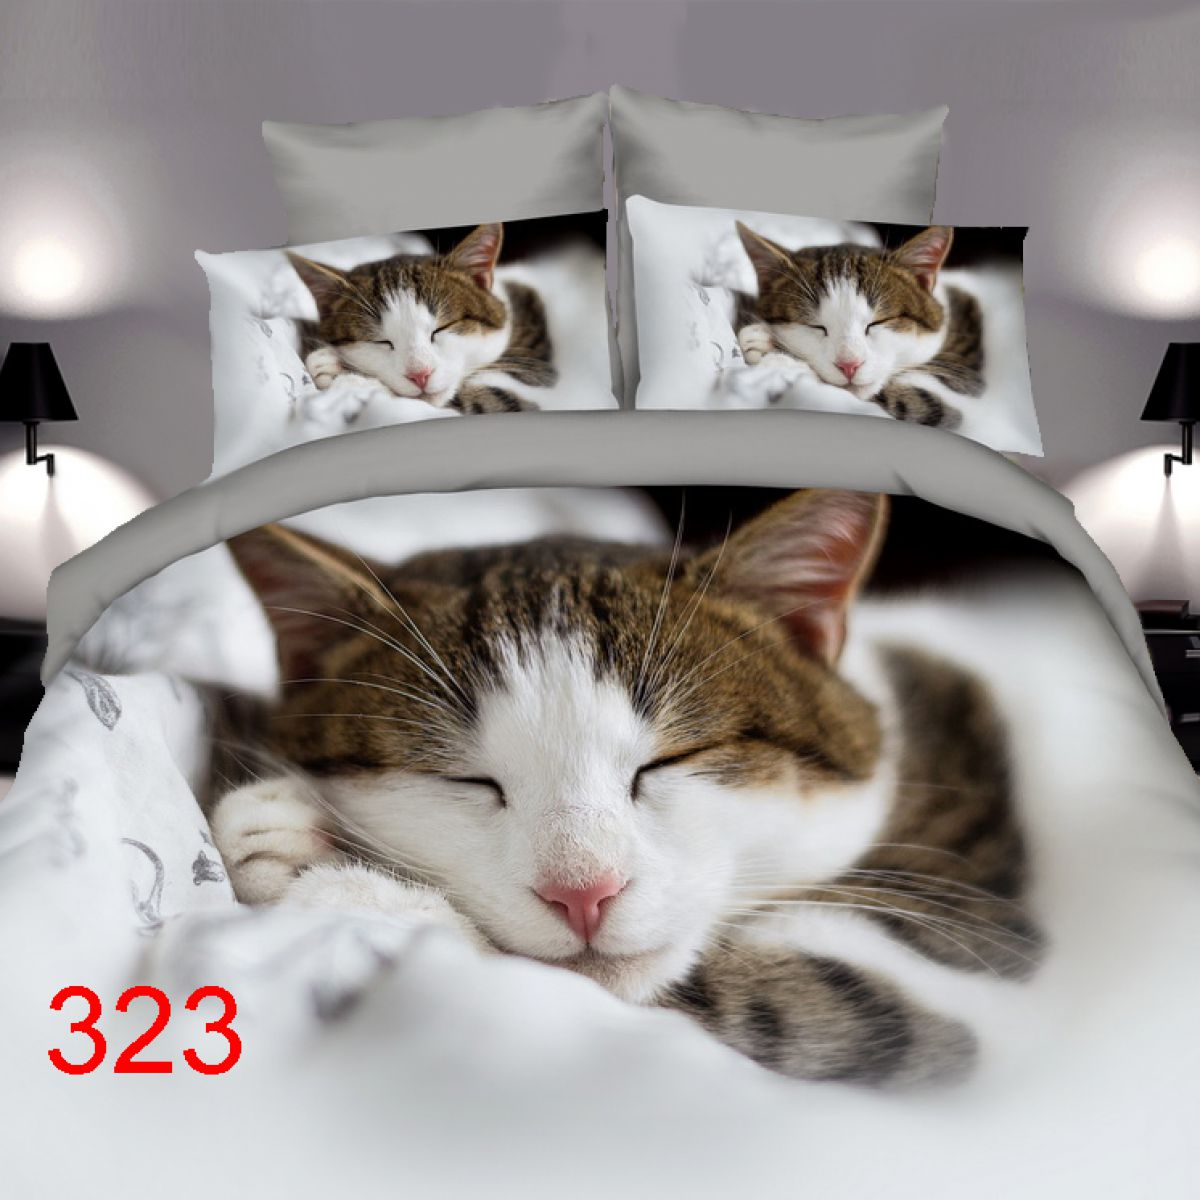 3D Beddings - Antonio - AML-323z - 160x200 cm - 4 pcs